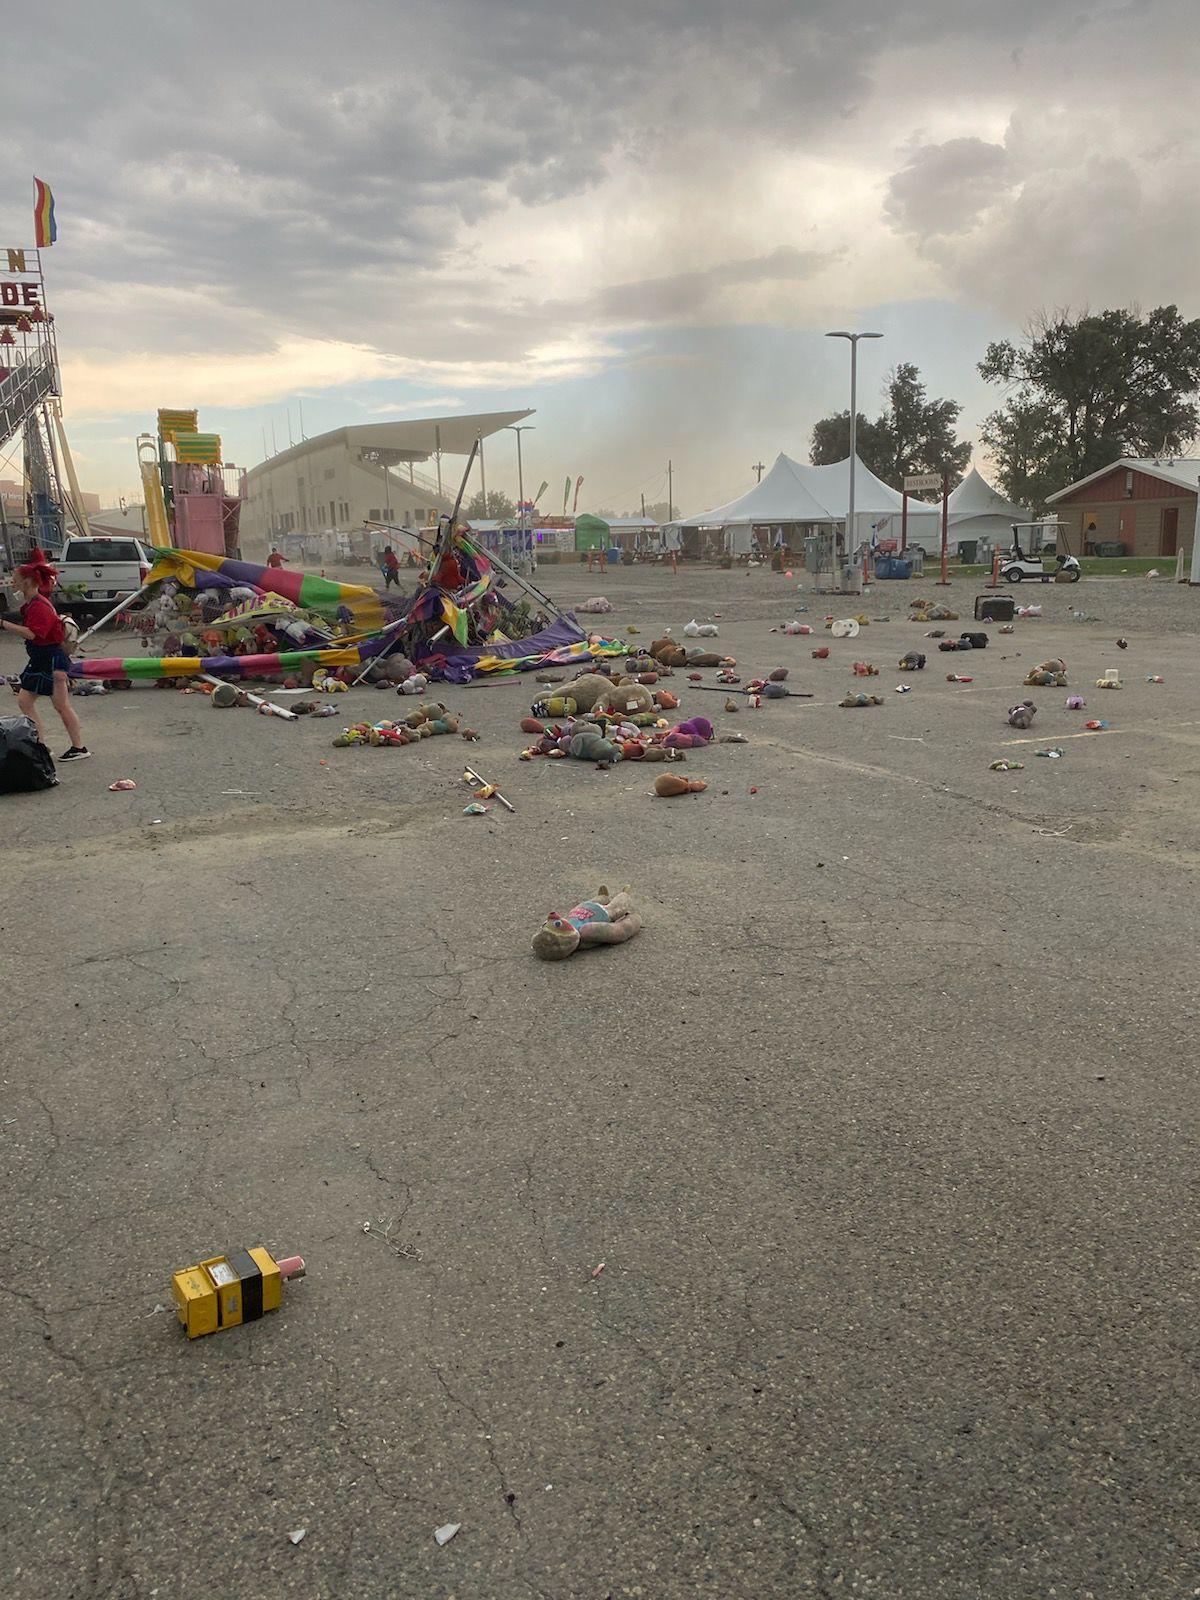 MontanaFair tent collapses